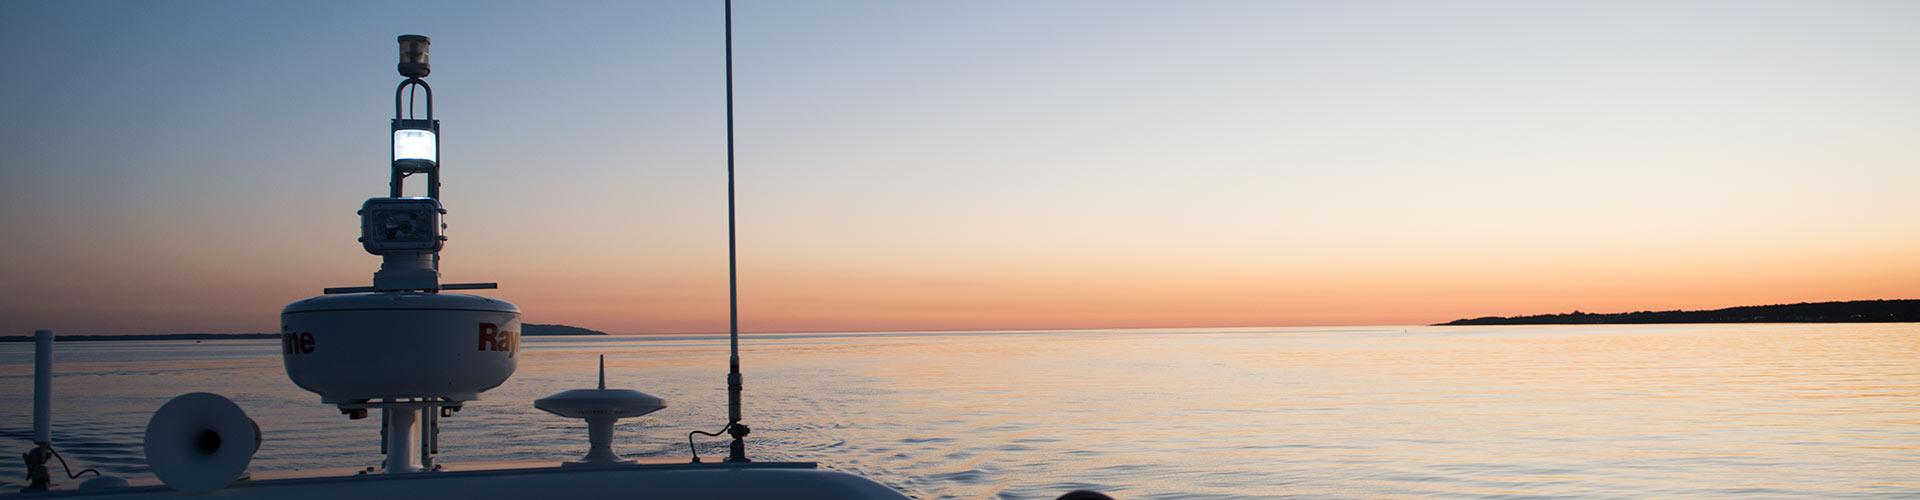 Panoramabild solnedgång